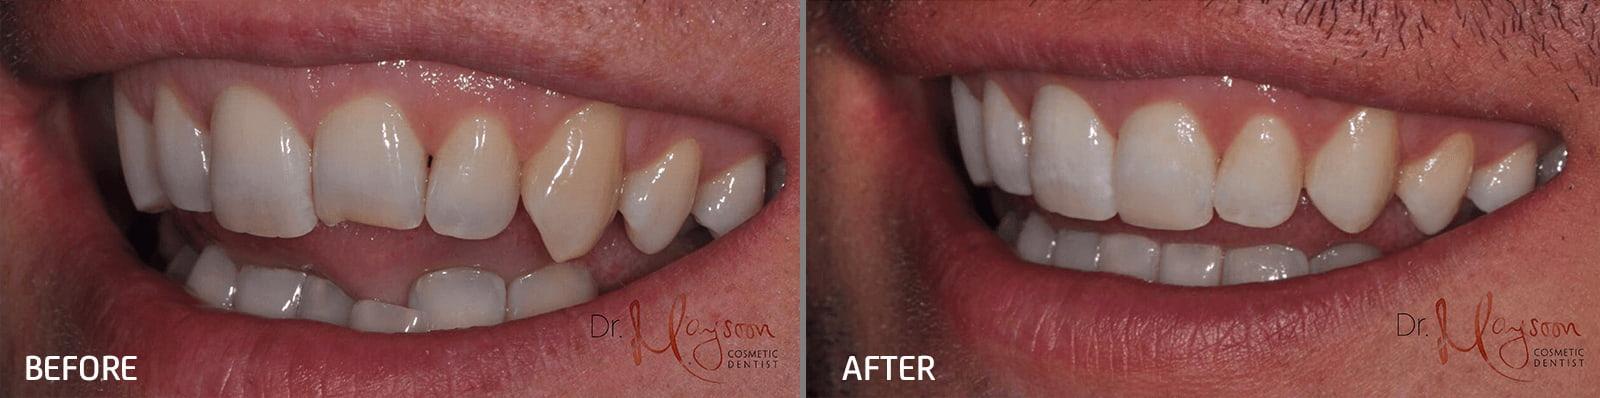 cosmetic bonding dr tosun dental clinic